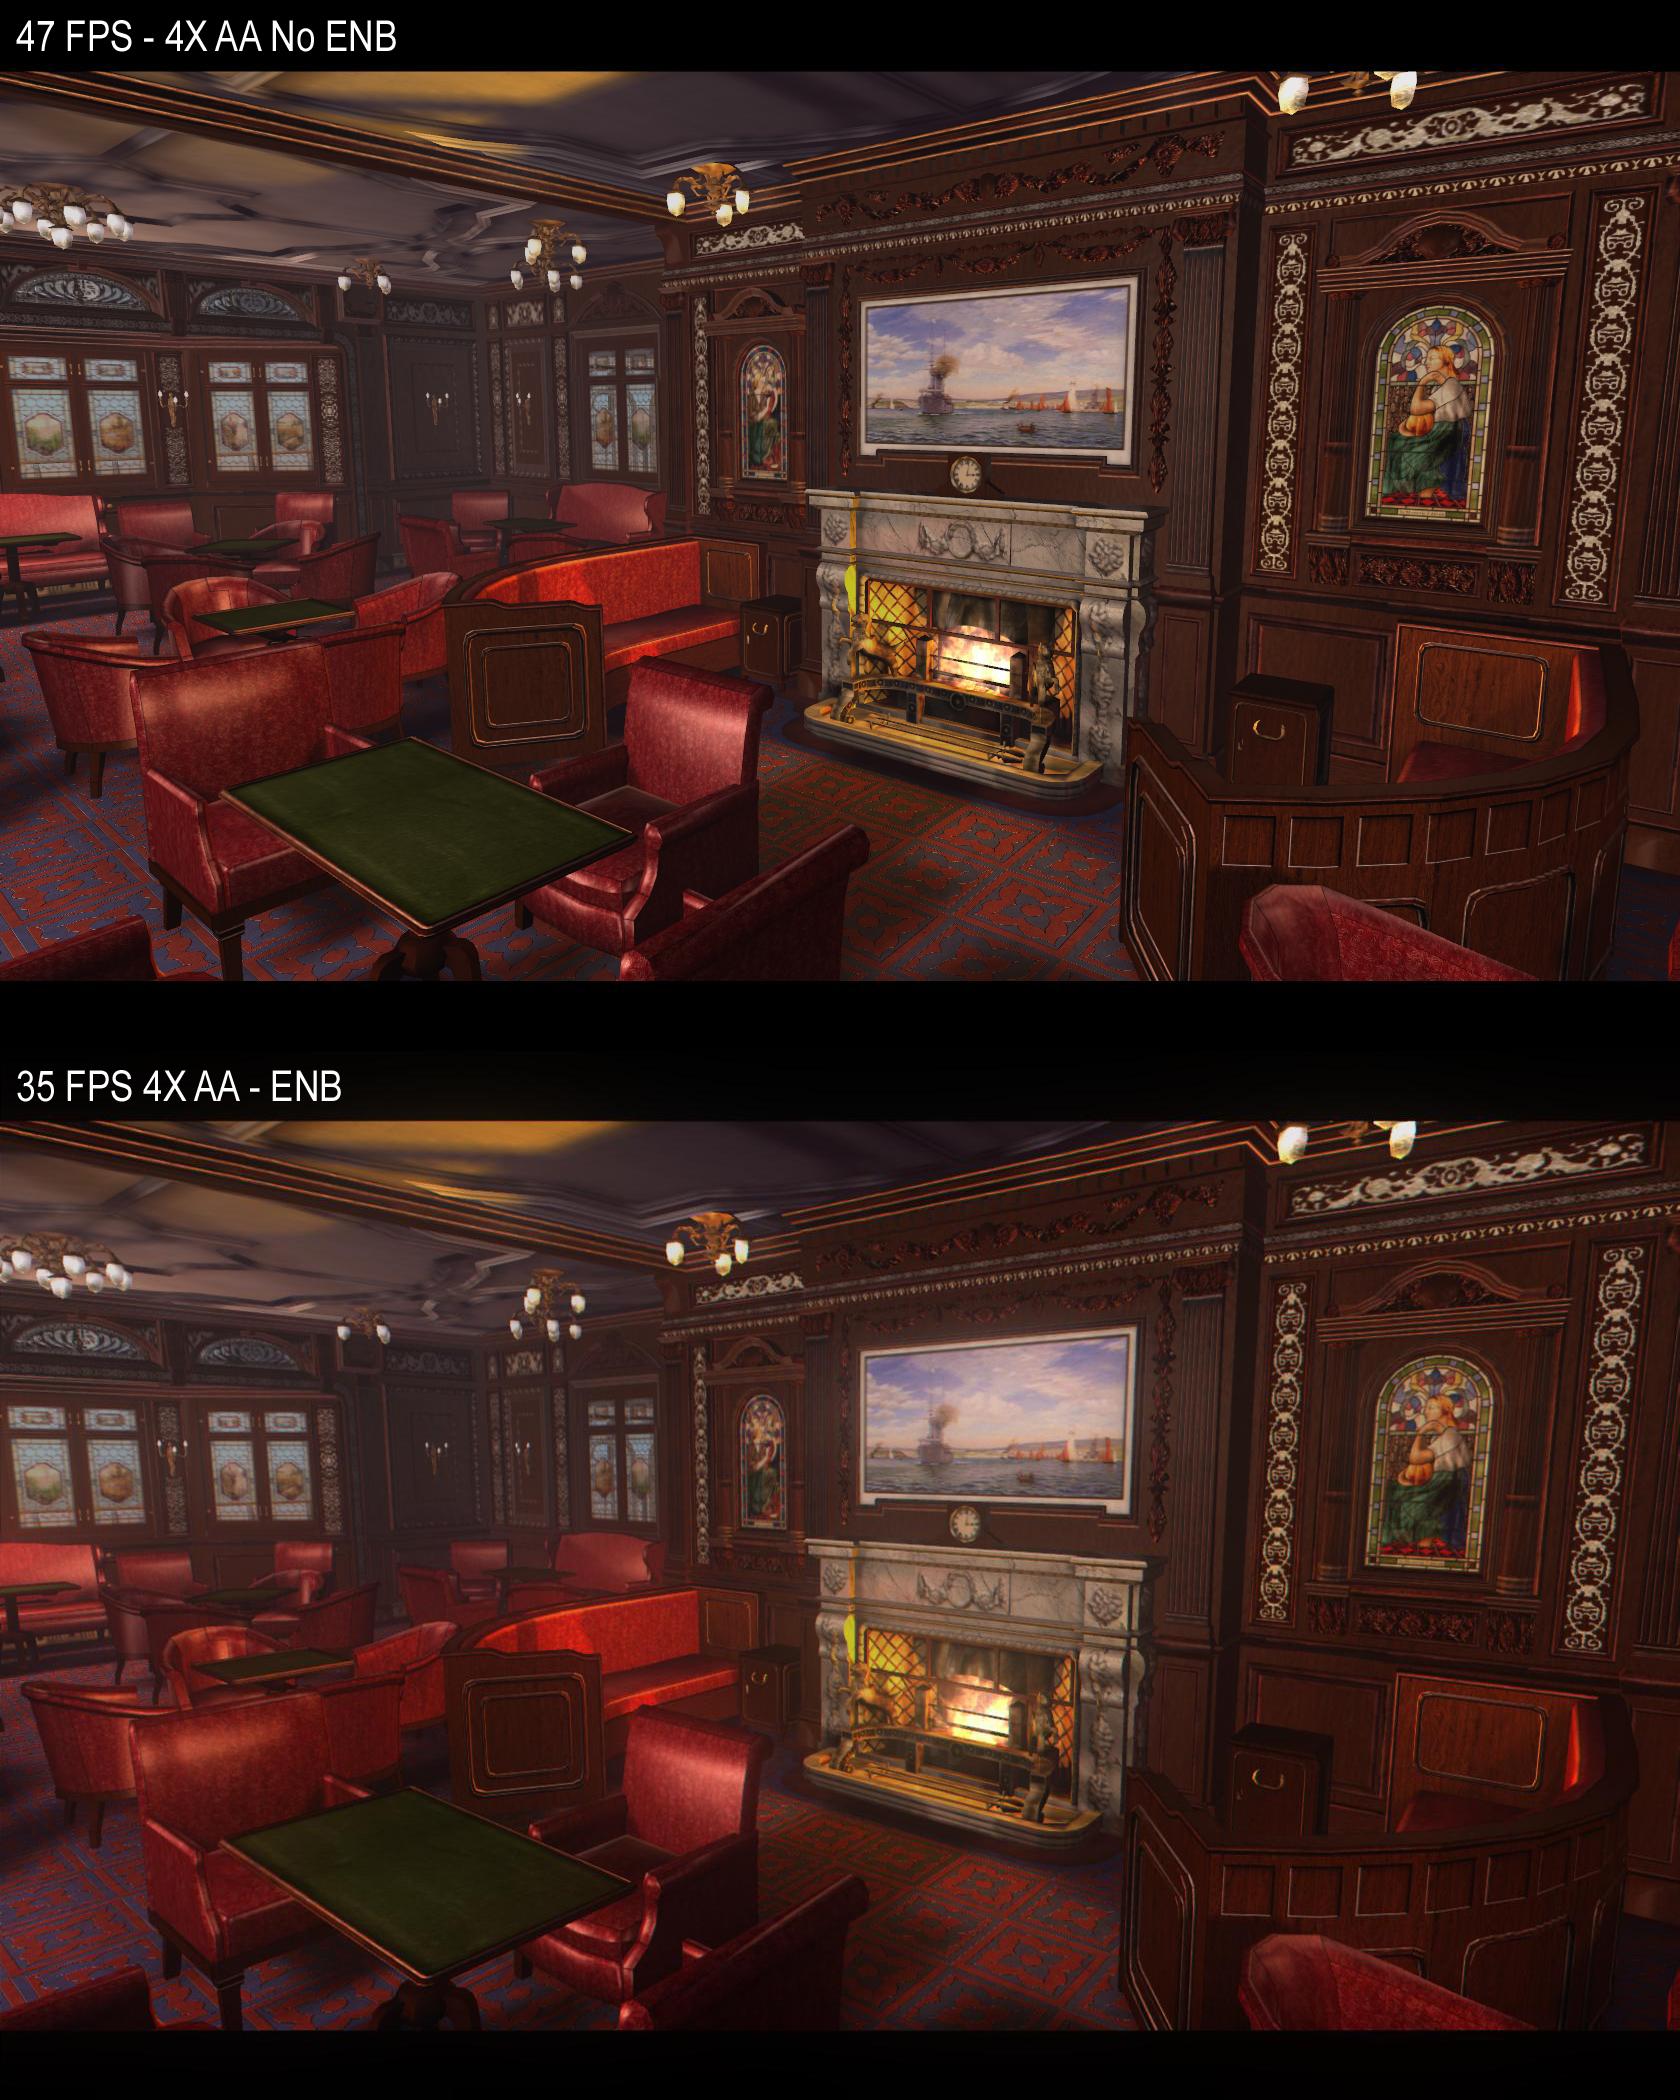 Titanic Engine Room Scene: Enb Series Graphic Tweak Image